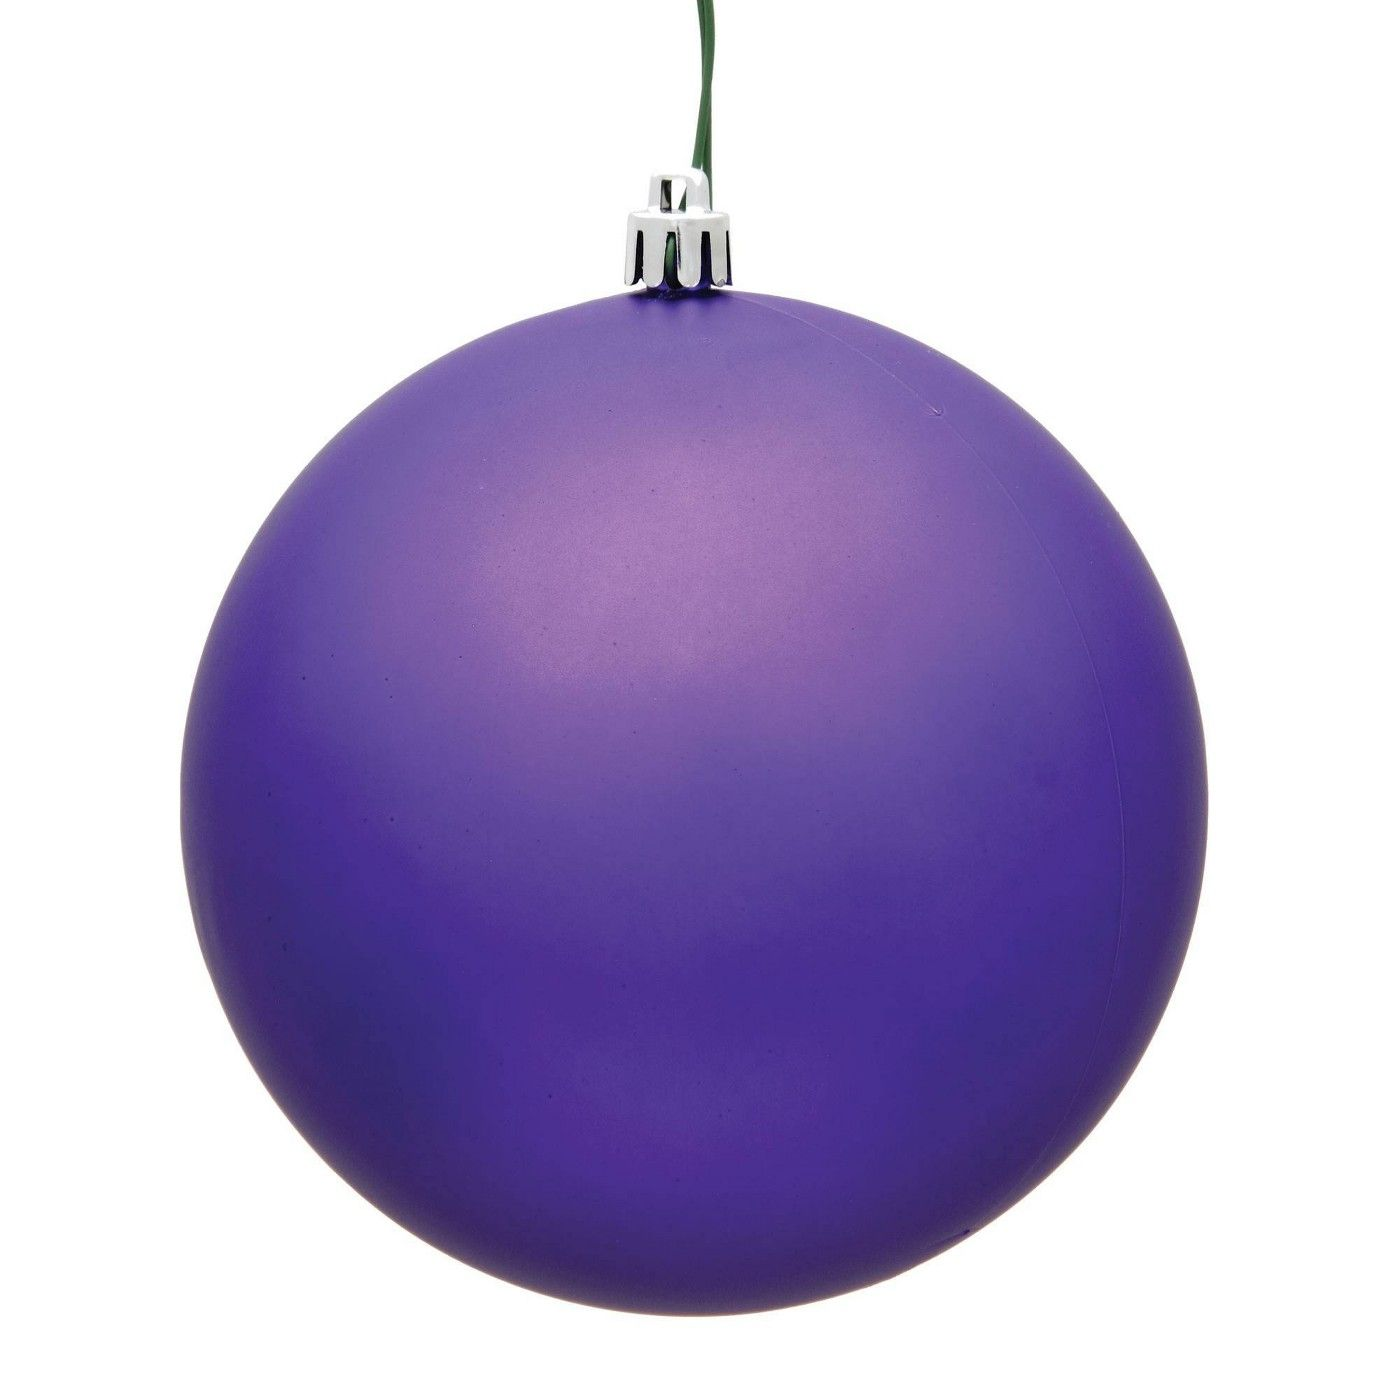 Vickerman 2 4 24ct Matte Ball Ornament Uv Coated Purple In 2020 Ball Ornaments Christmas Ornaments Ornaments